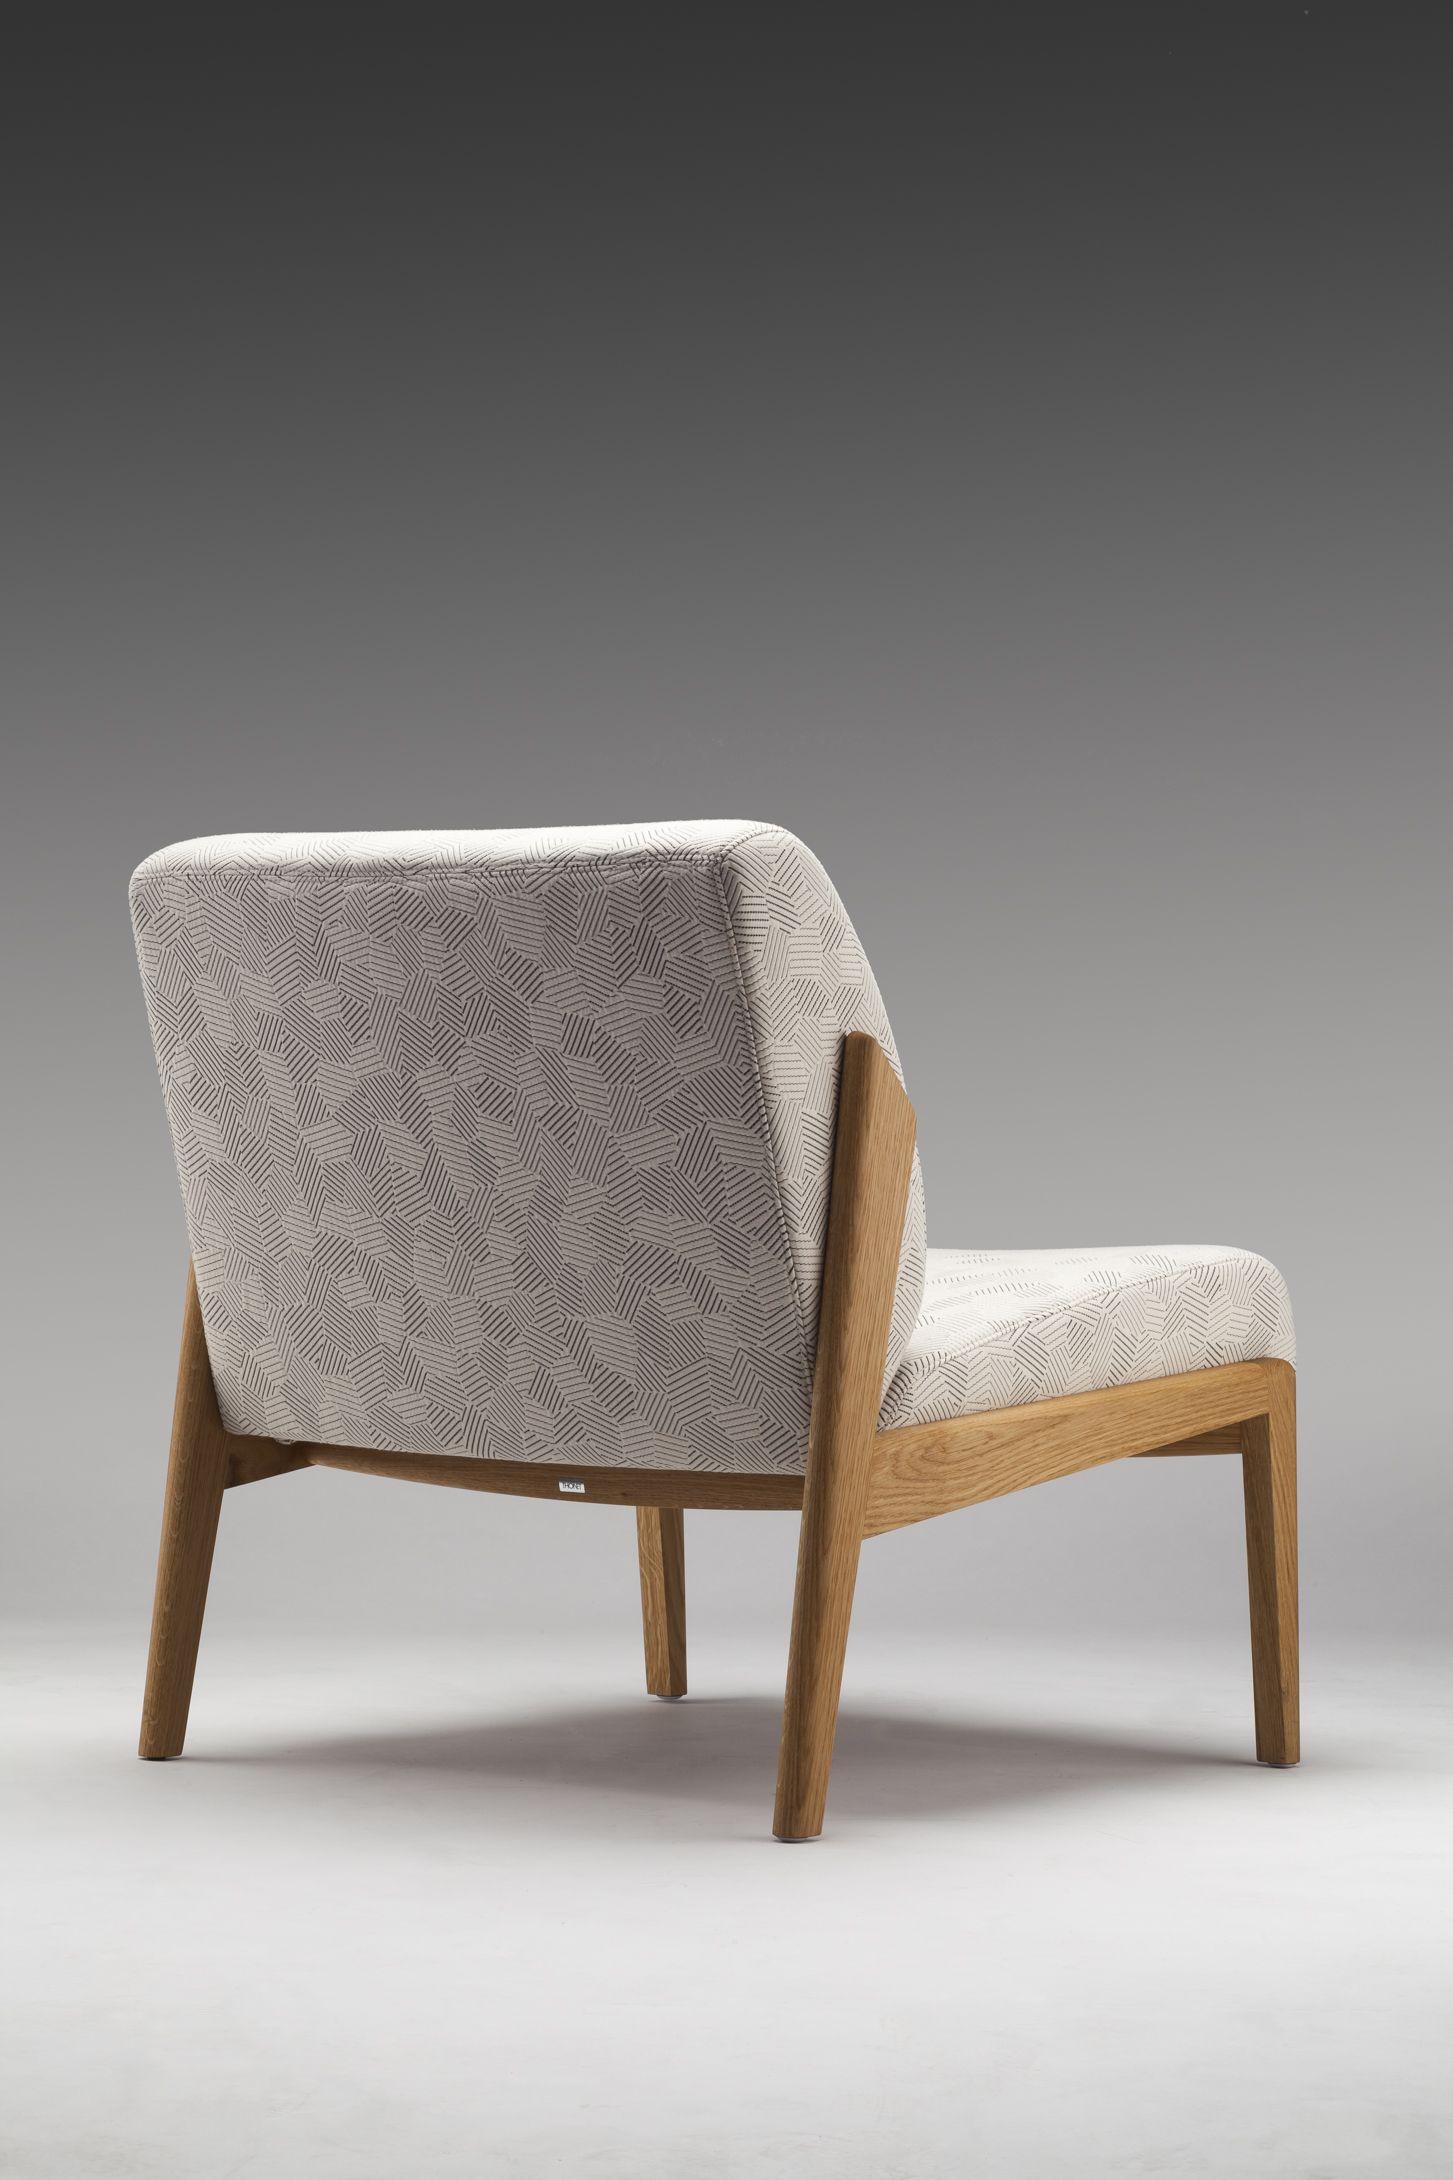 Thonet chair programme range 860 by Lydia Brodde of the Thonet Design Team